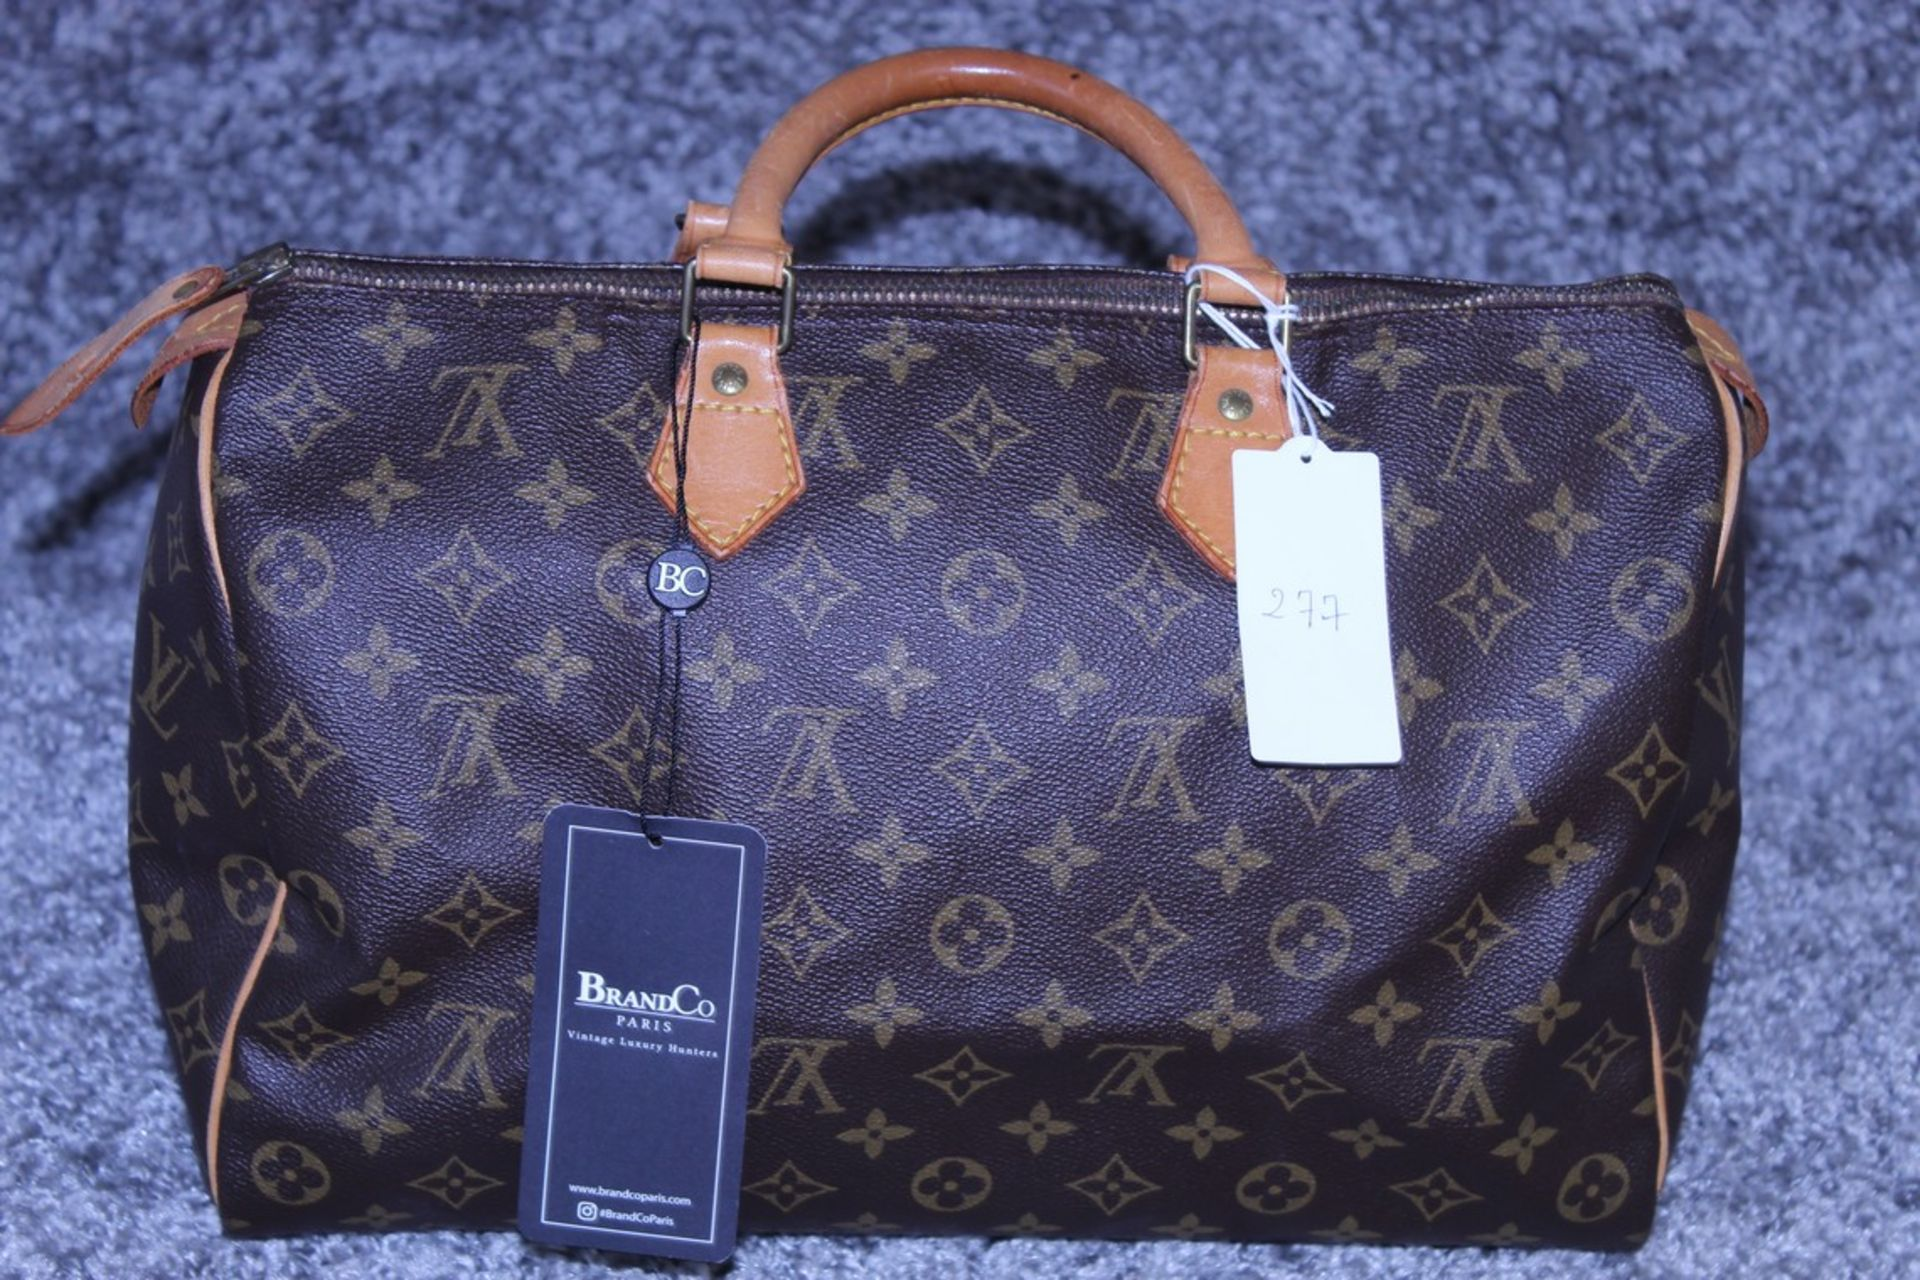 RRP £1100 Louis Vuitton Speedy Brown Coated Monogram Canvas Handbag With Vachetta Handles (